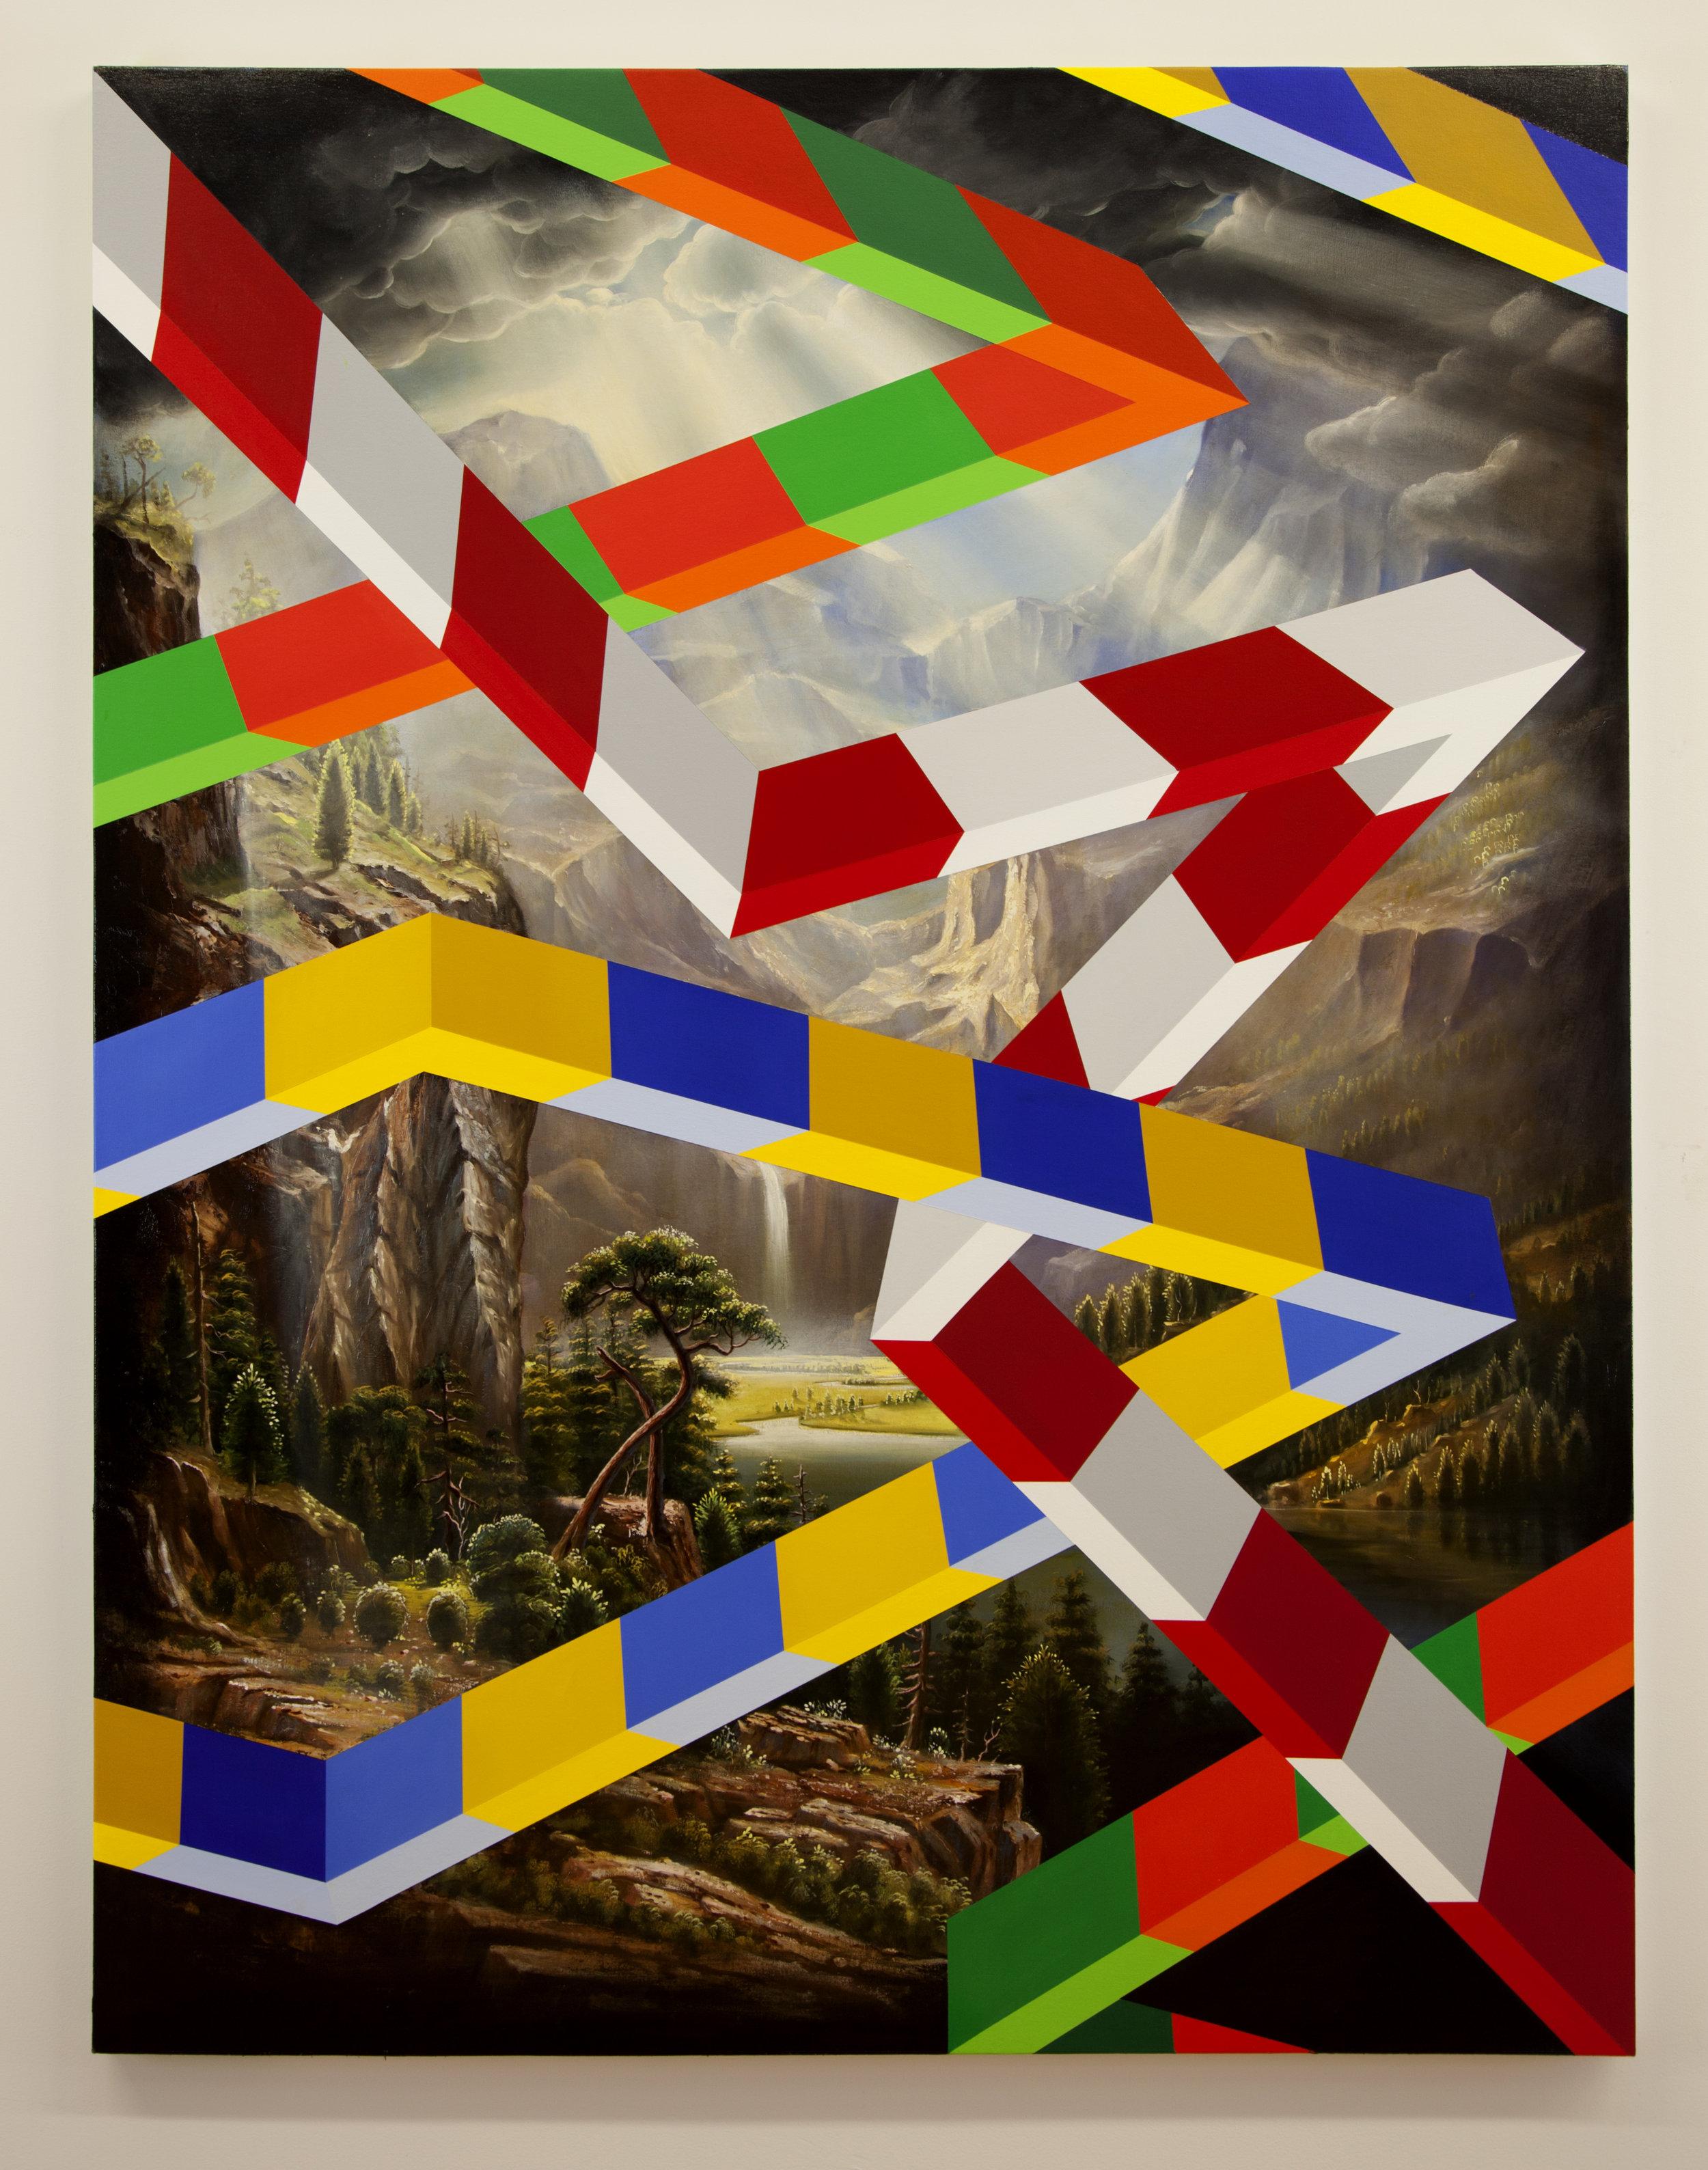 PETER DAVERINGTON   Five Points  2018 Oil and acrylic on canvas 183 x 154 cm